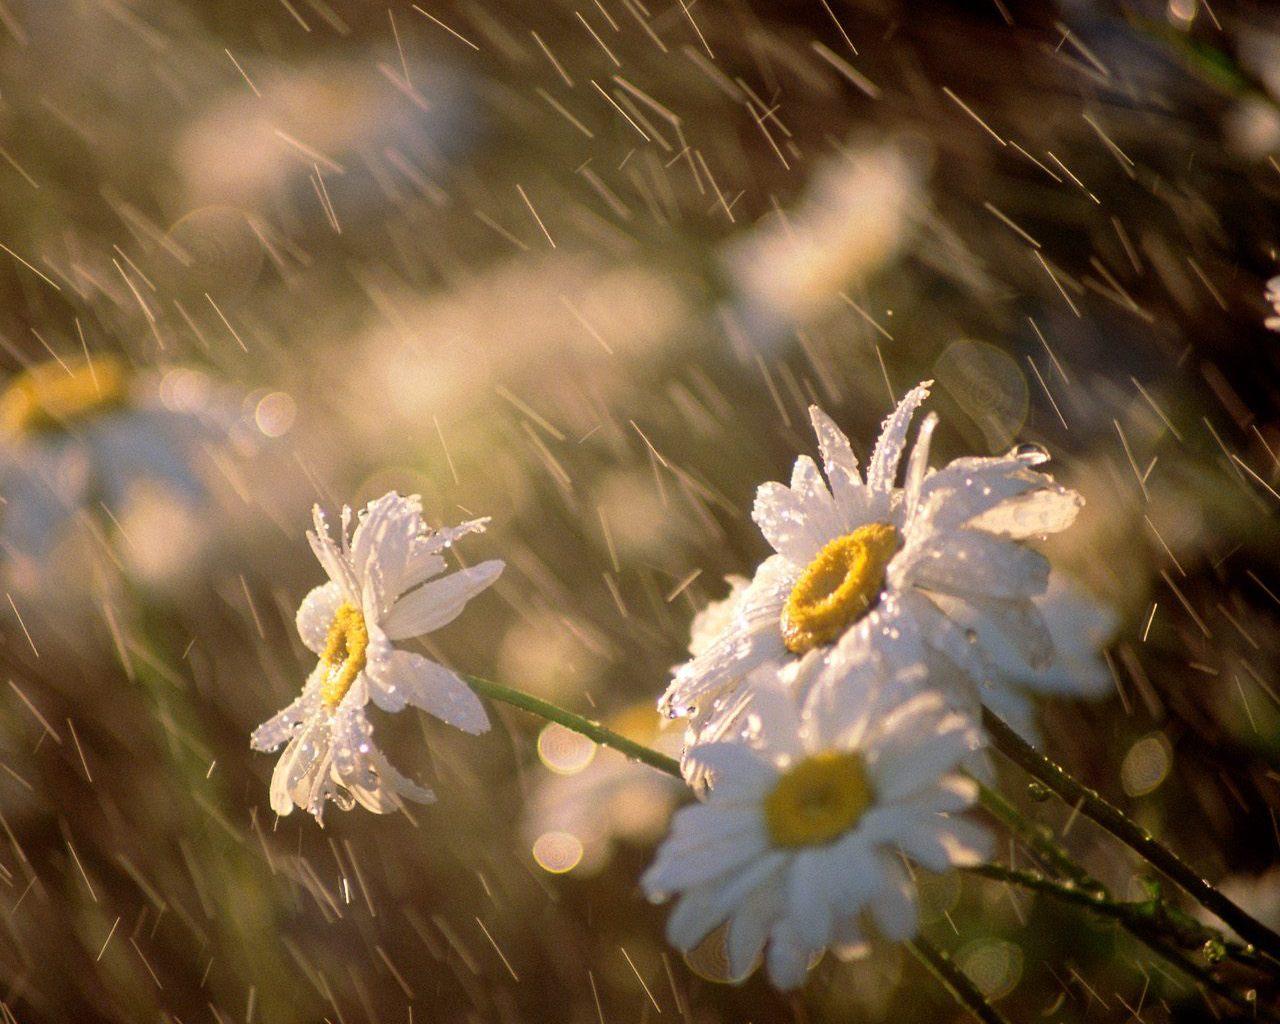 http://1.bp.blogspot.com/-kABfOryE6tA/T5LUDungmBI/AAAAAAAAAUE/KDGnlHH-bOI/s1600/daisies.jpg